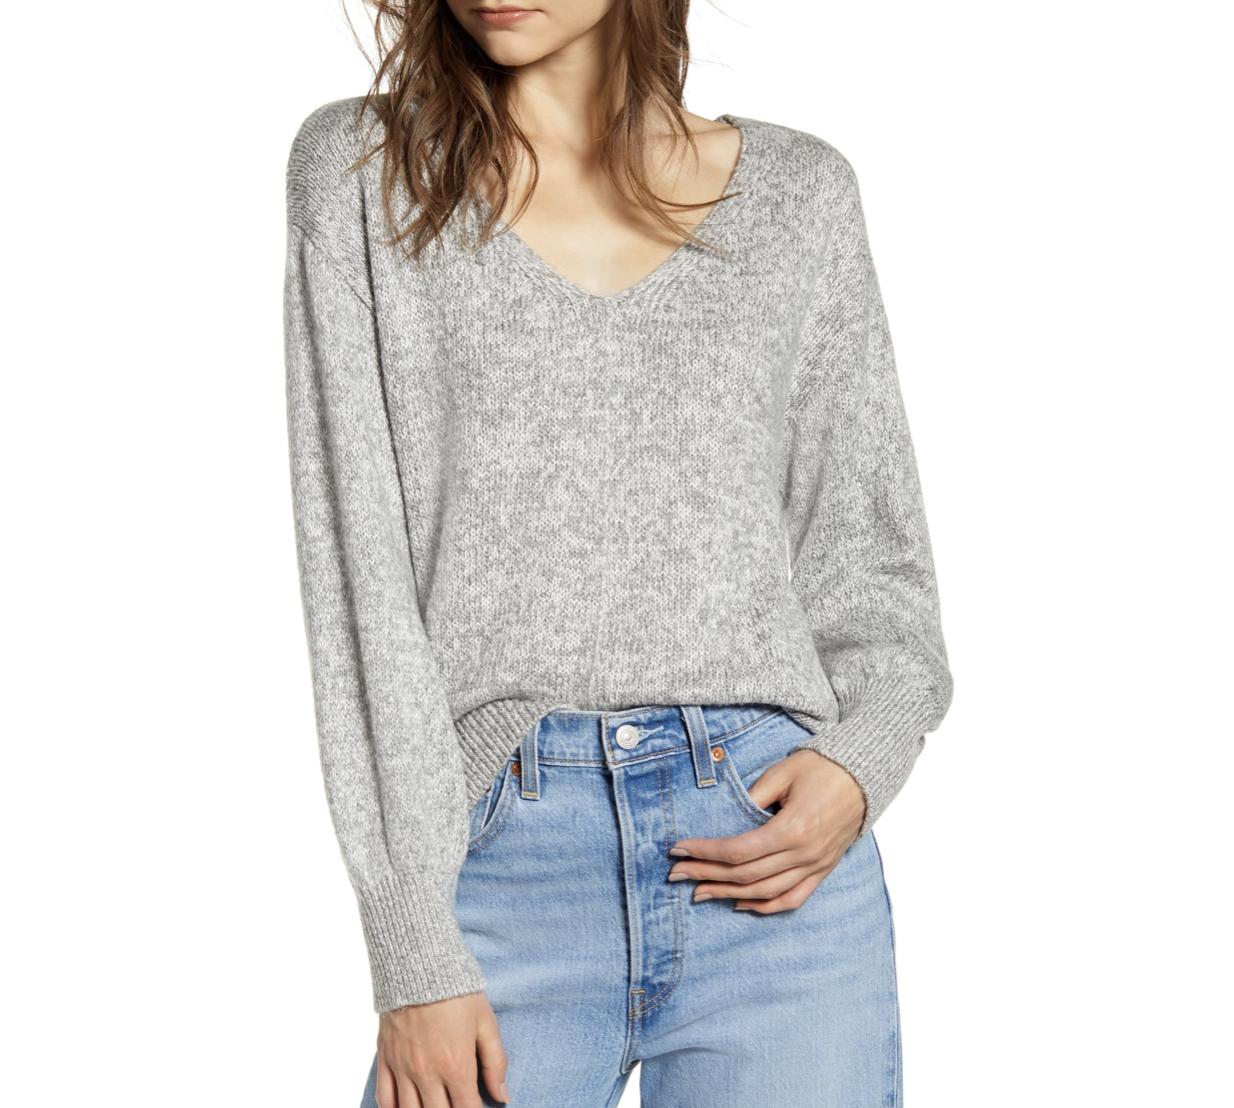 Basic Gray Sweater | Nordstrom Anniversary Sale 2019 | A Demure Life Fashion Blog